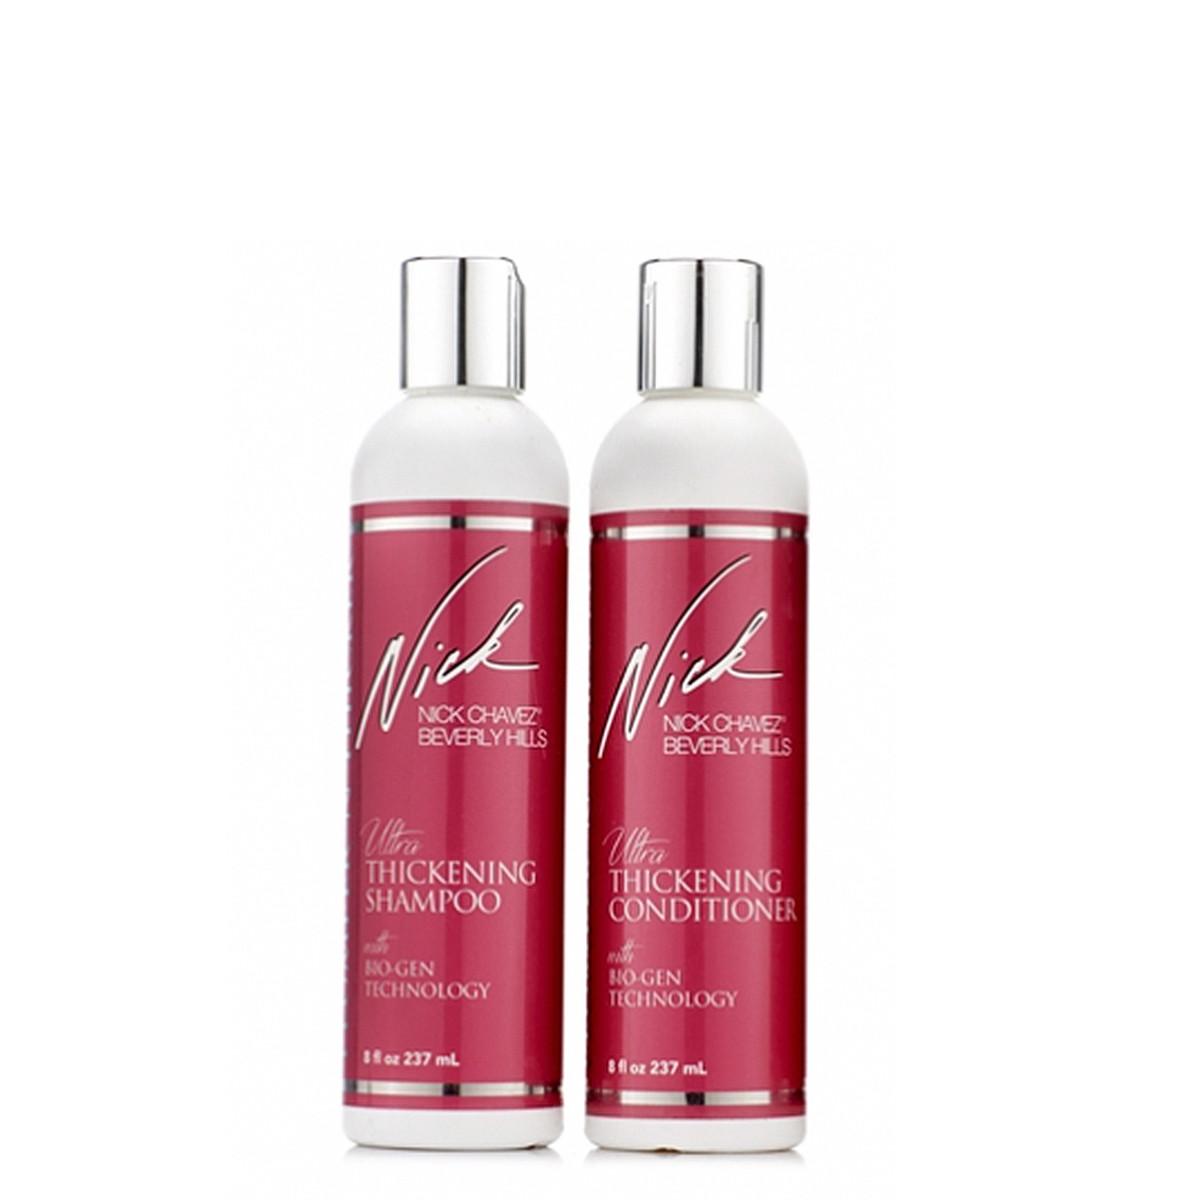 8oz Plumper 'n Thicker Shampoo & Conditioner DUO